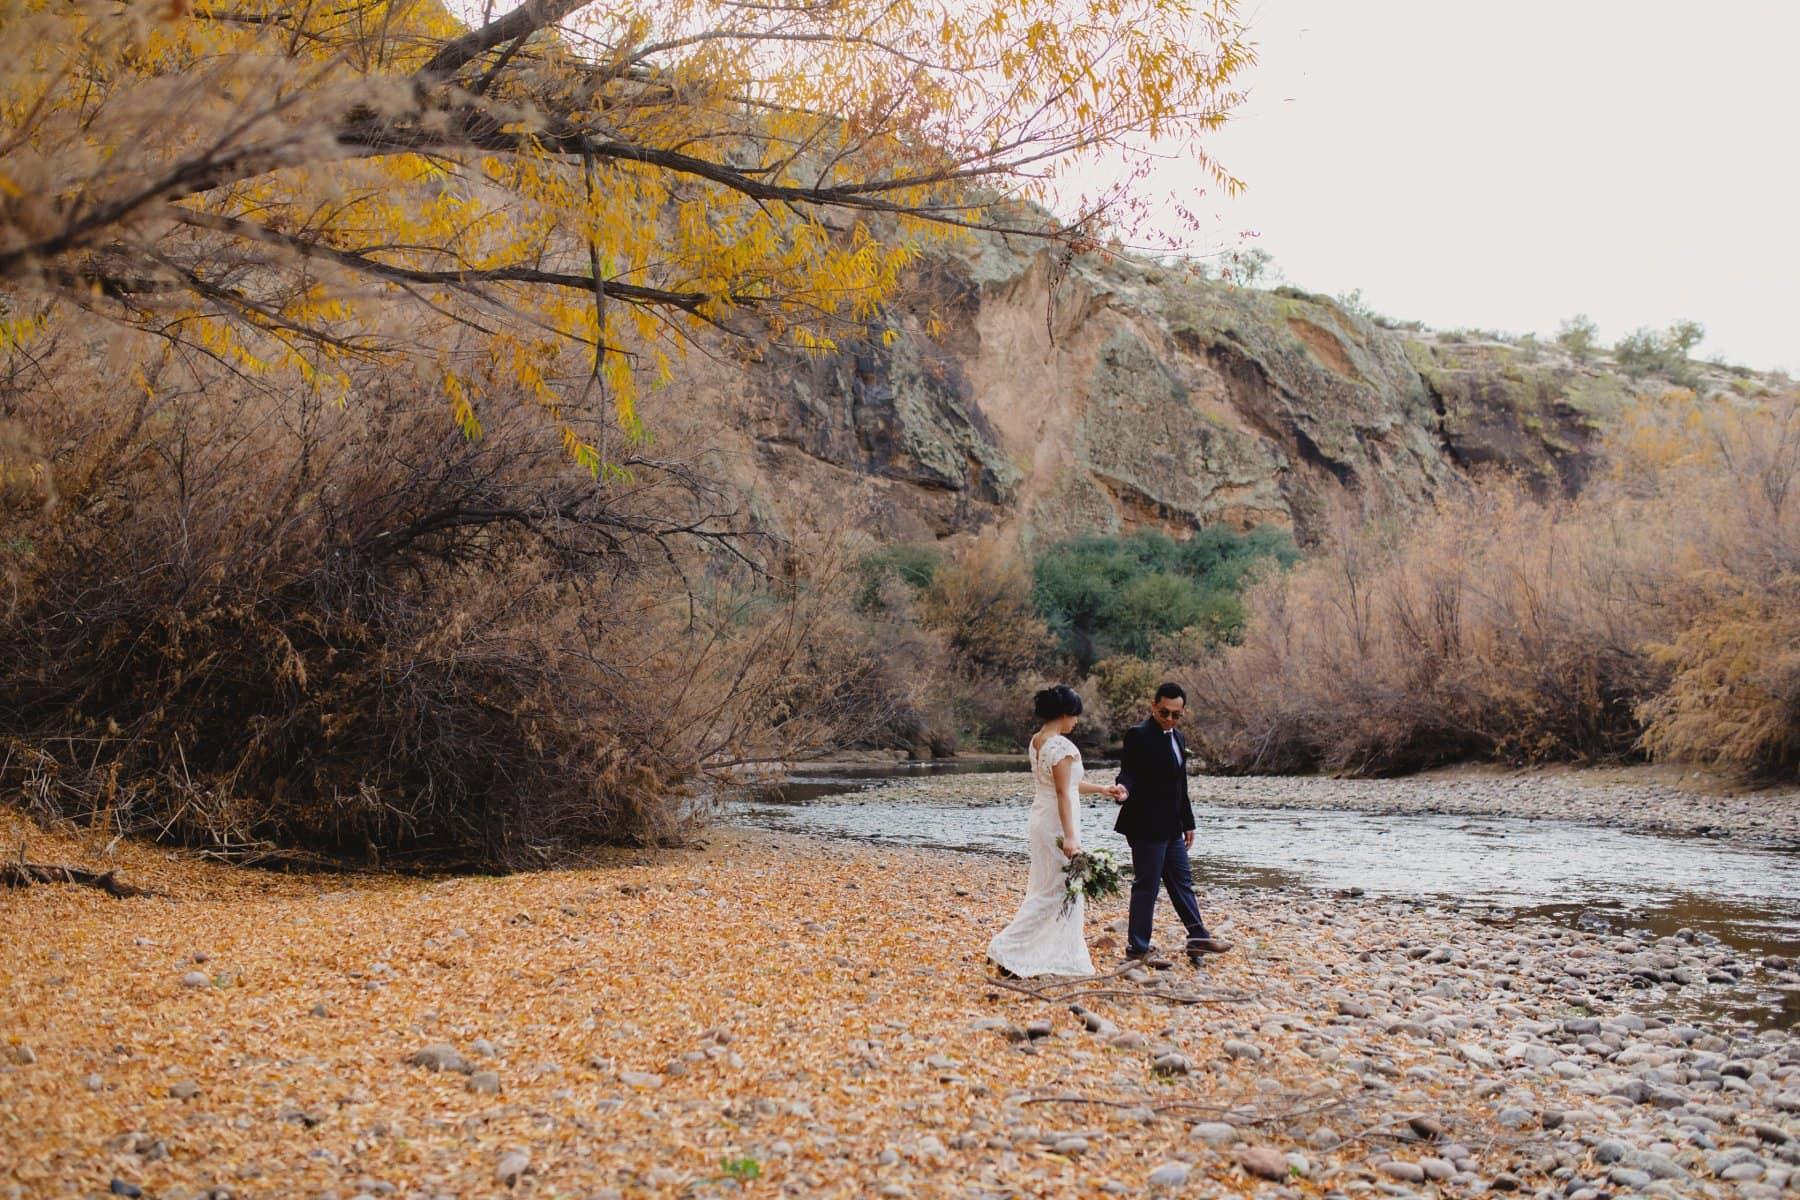 outdoorsy wedding location in Arizona